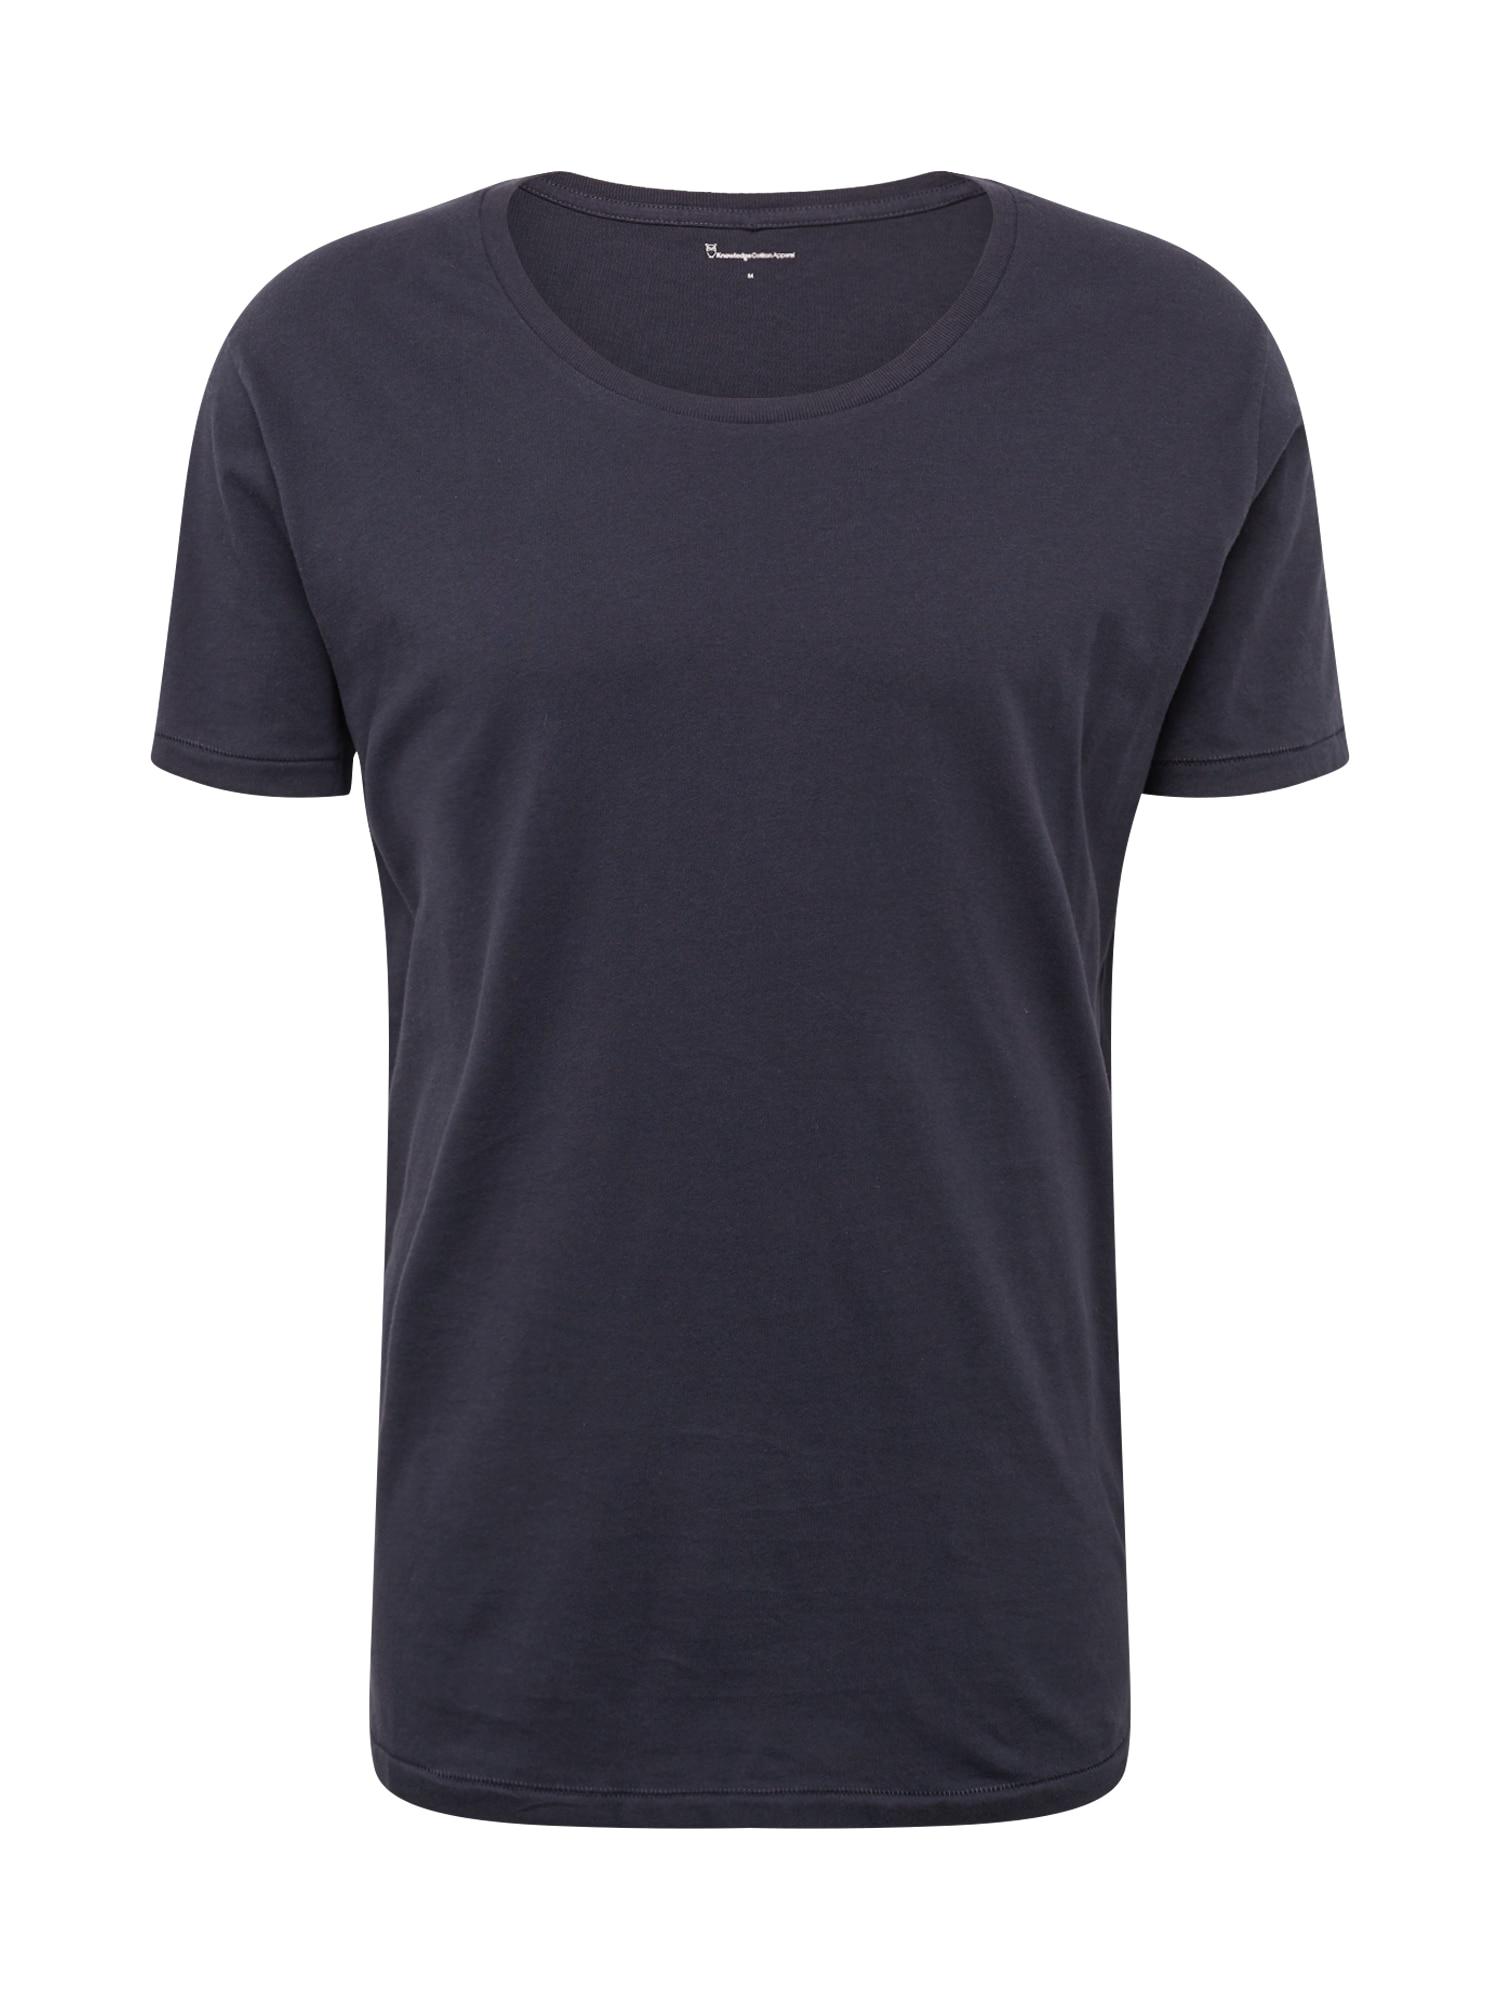 Tričko tmavě modrá KnowledgeCotton Apparel